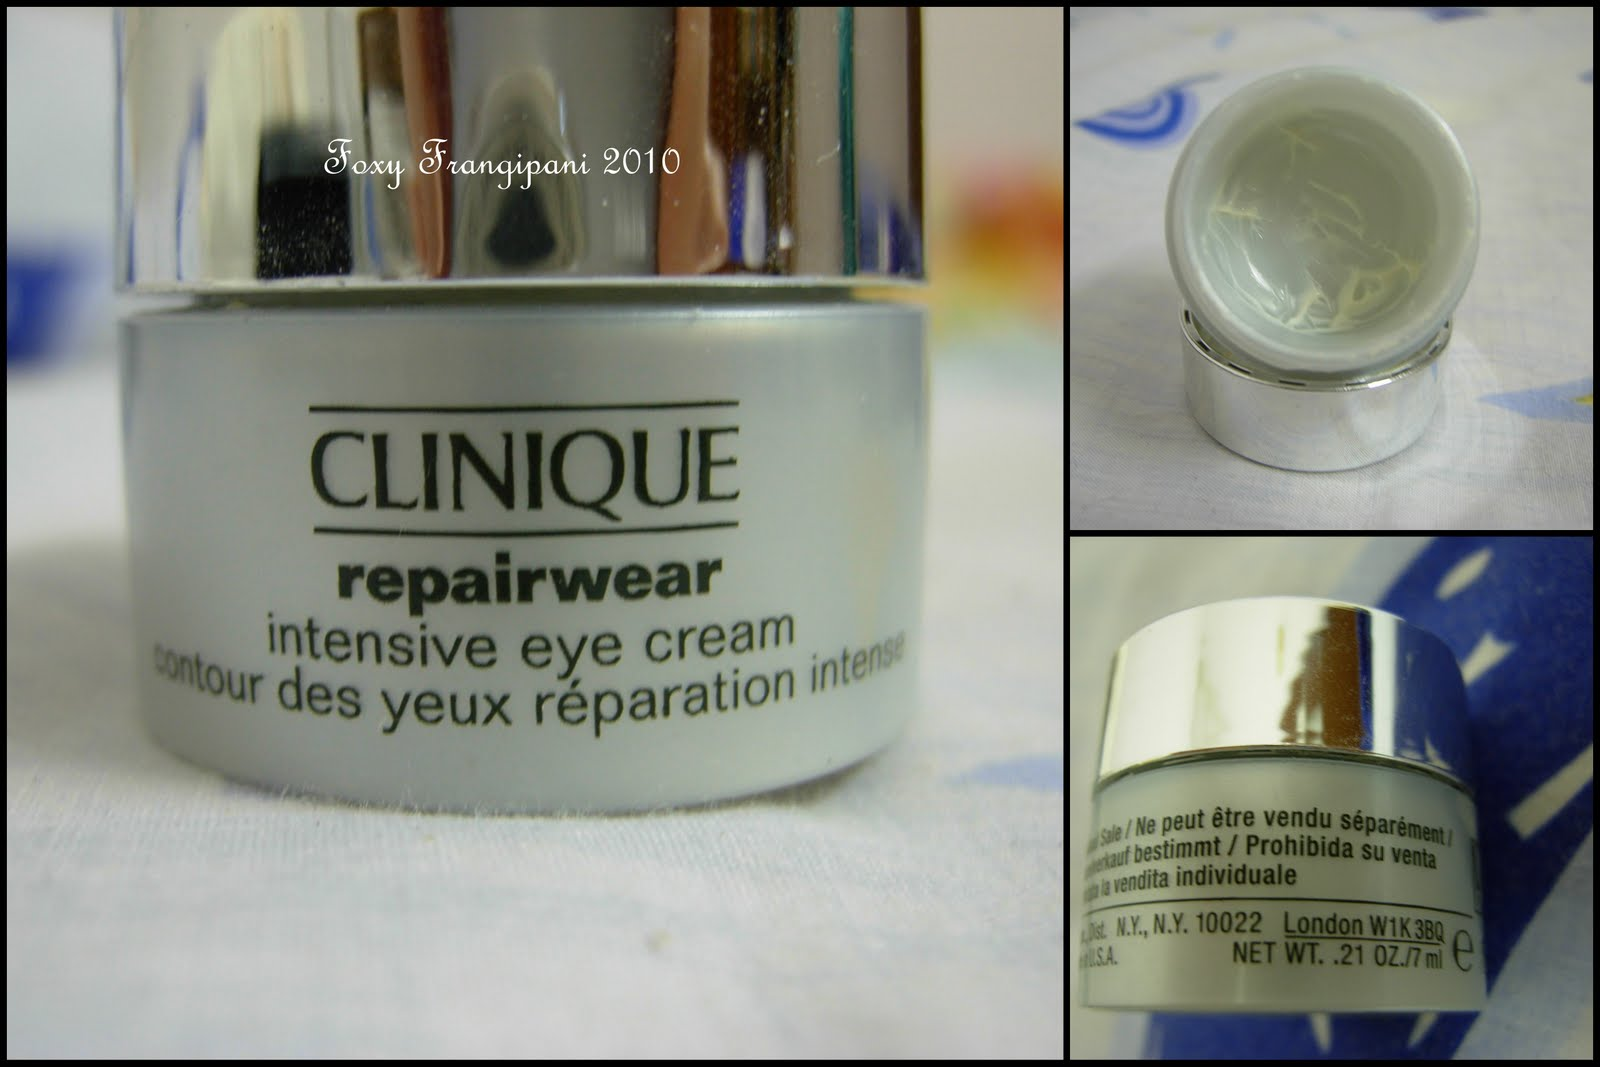 clinique eye cream in Latvia